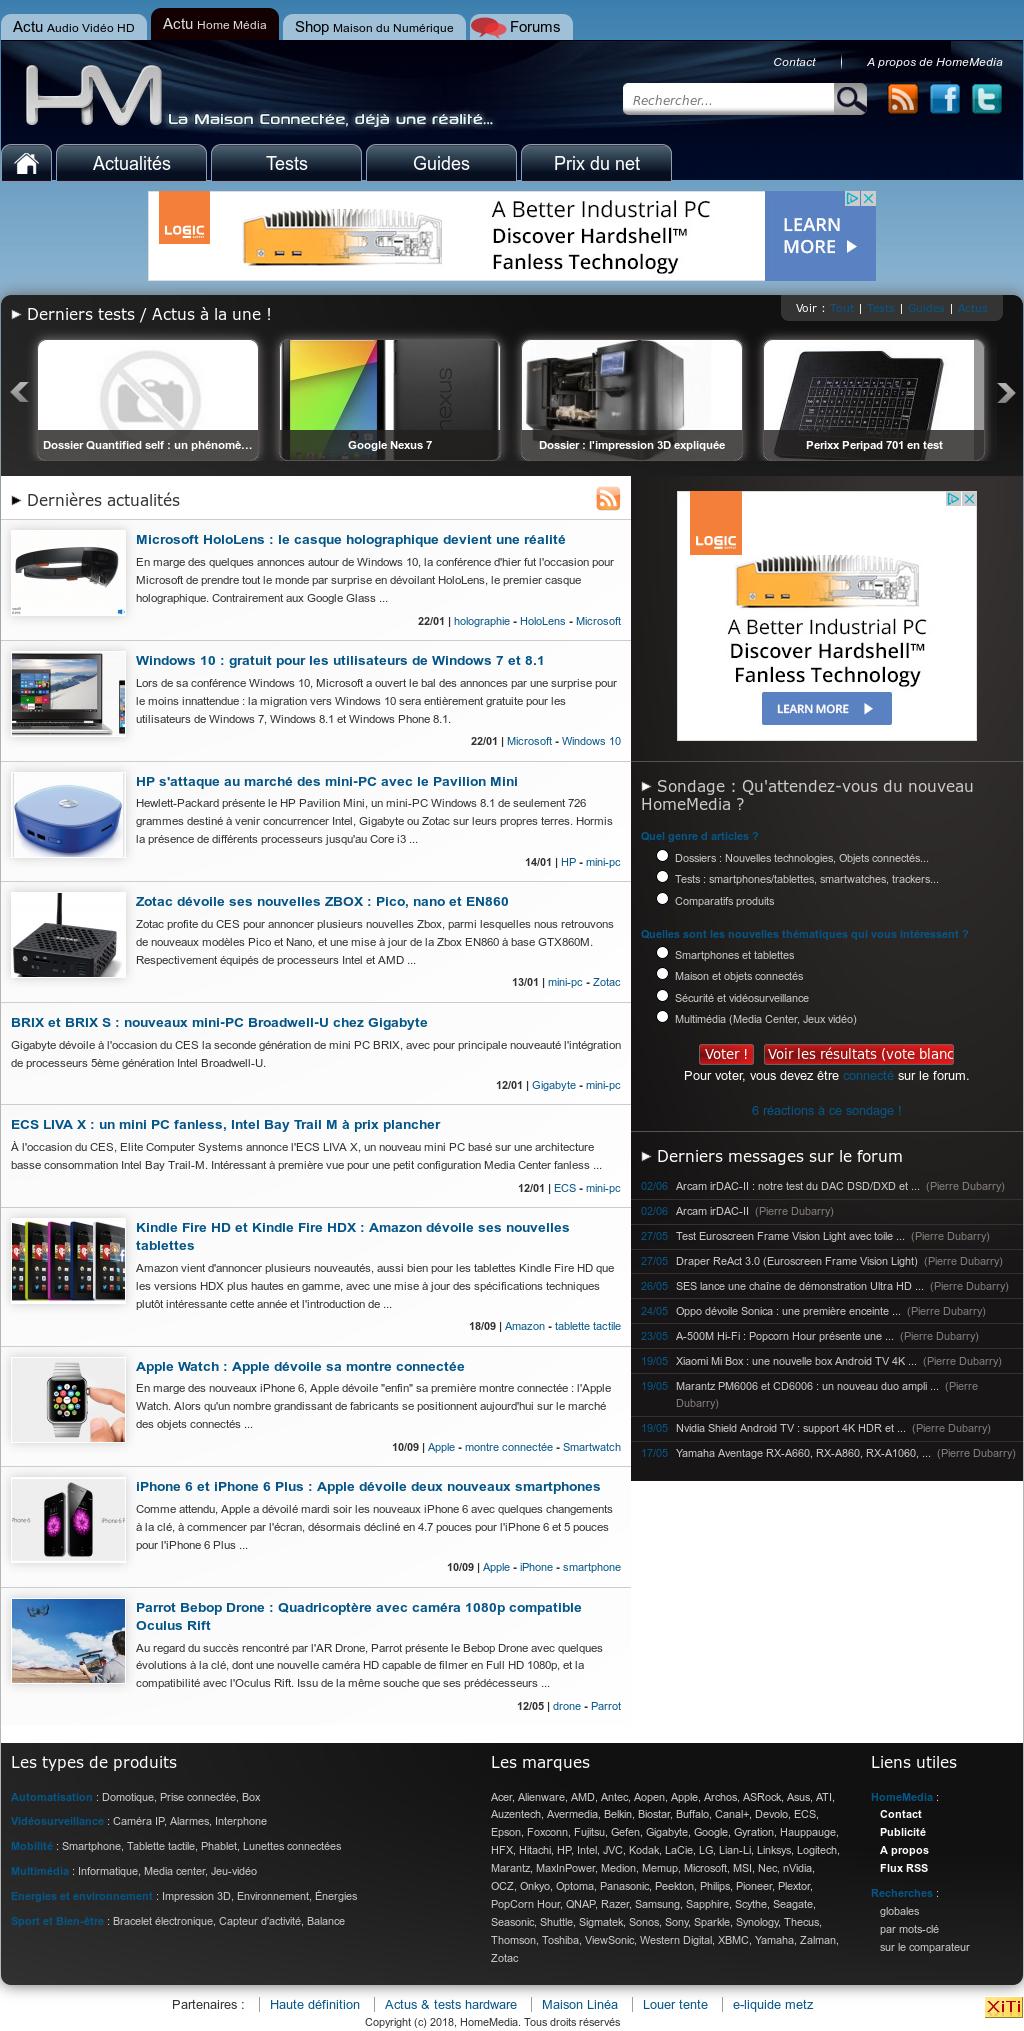 Homemedia Competitors, Revenue and Employees - Owler Company Profile